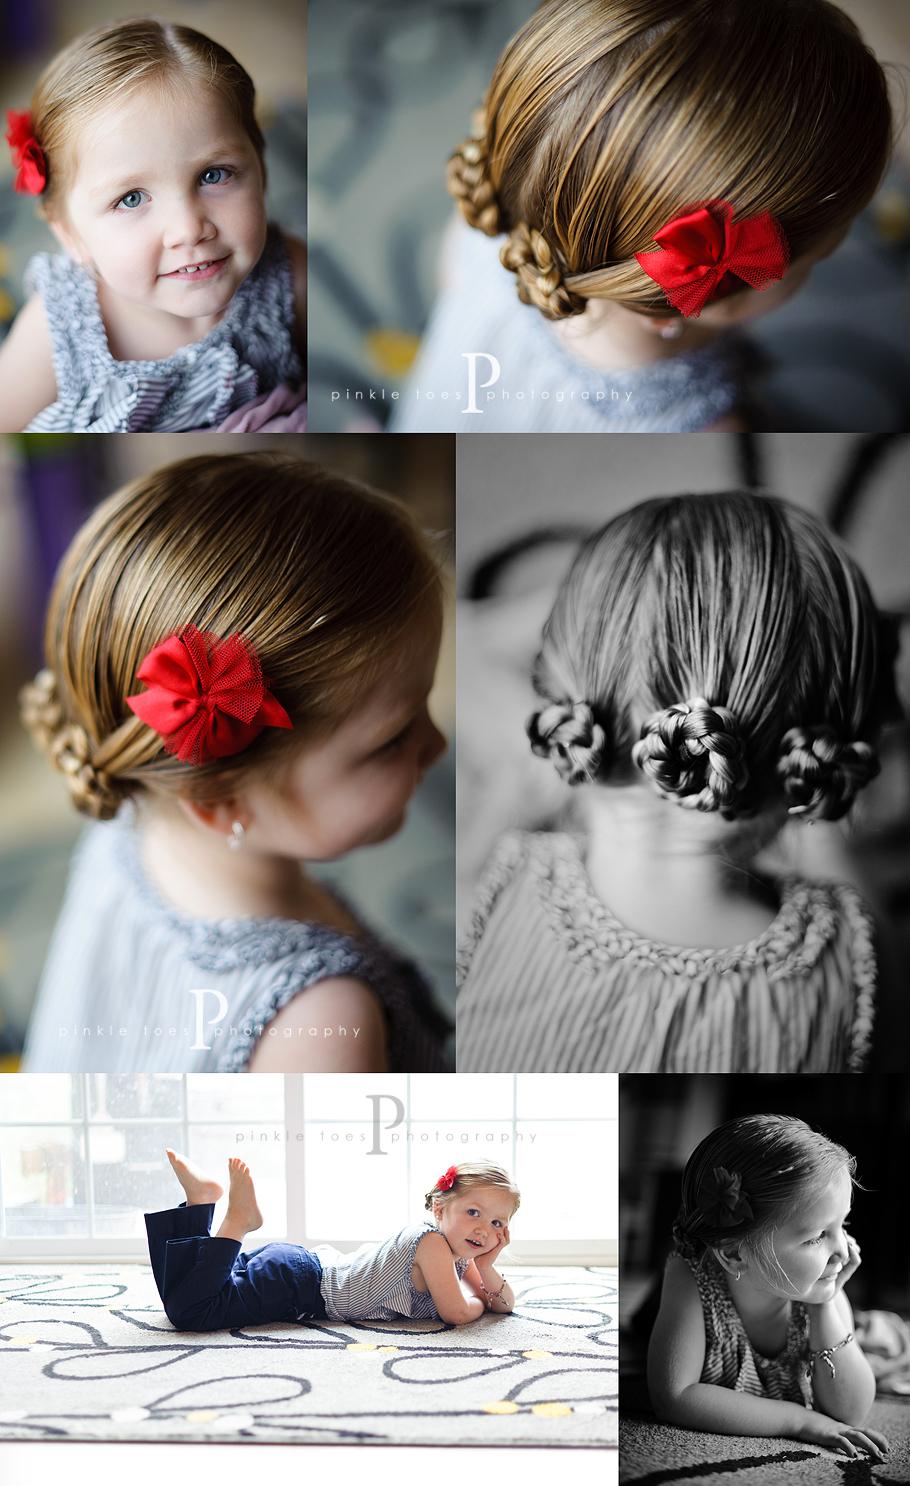 braids-austin-lifestyle-commercial-kids-photographer.jpg